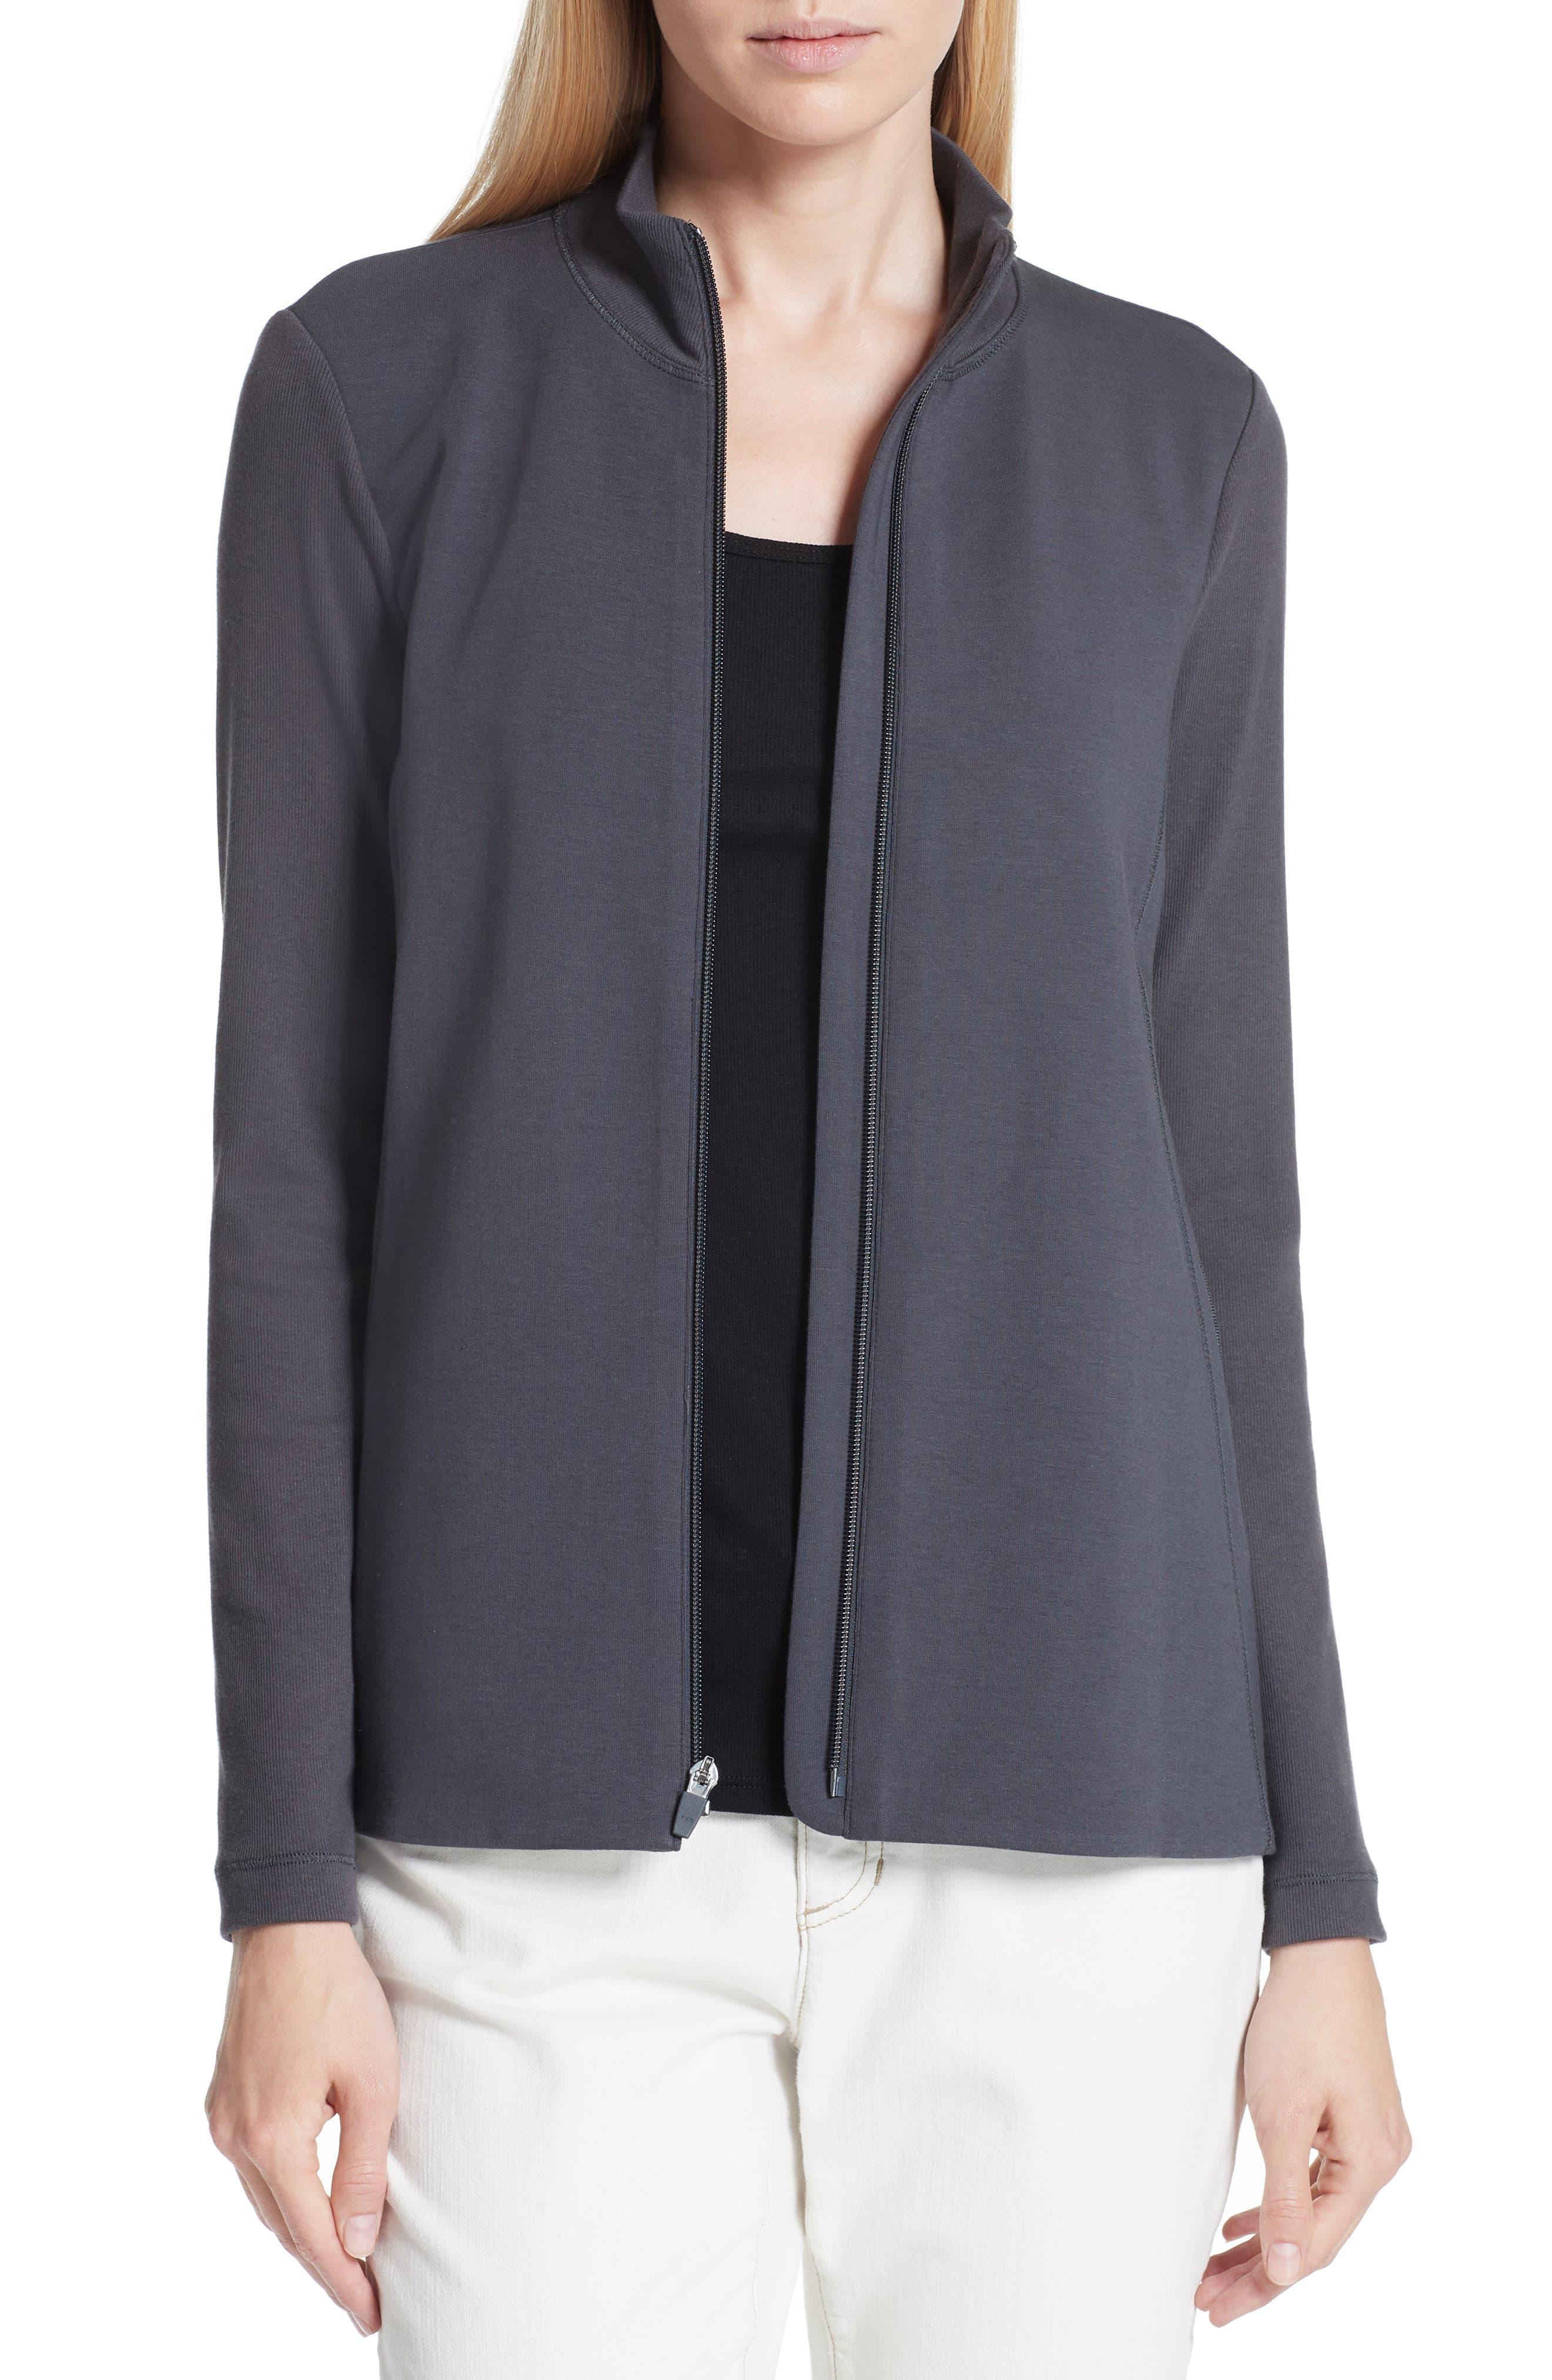 Mixed Organic Cotton Stretch Knit Jacket,                             Main thumbnail 1, color,                             025